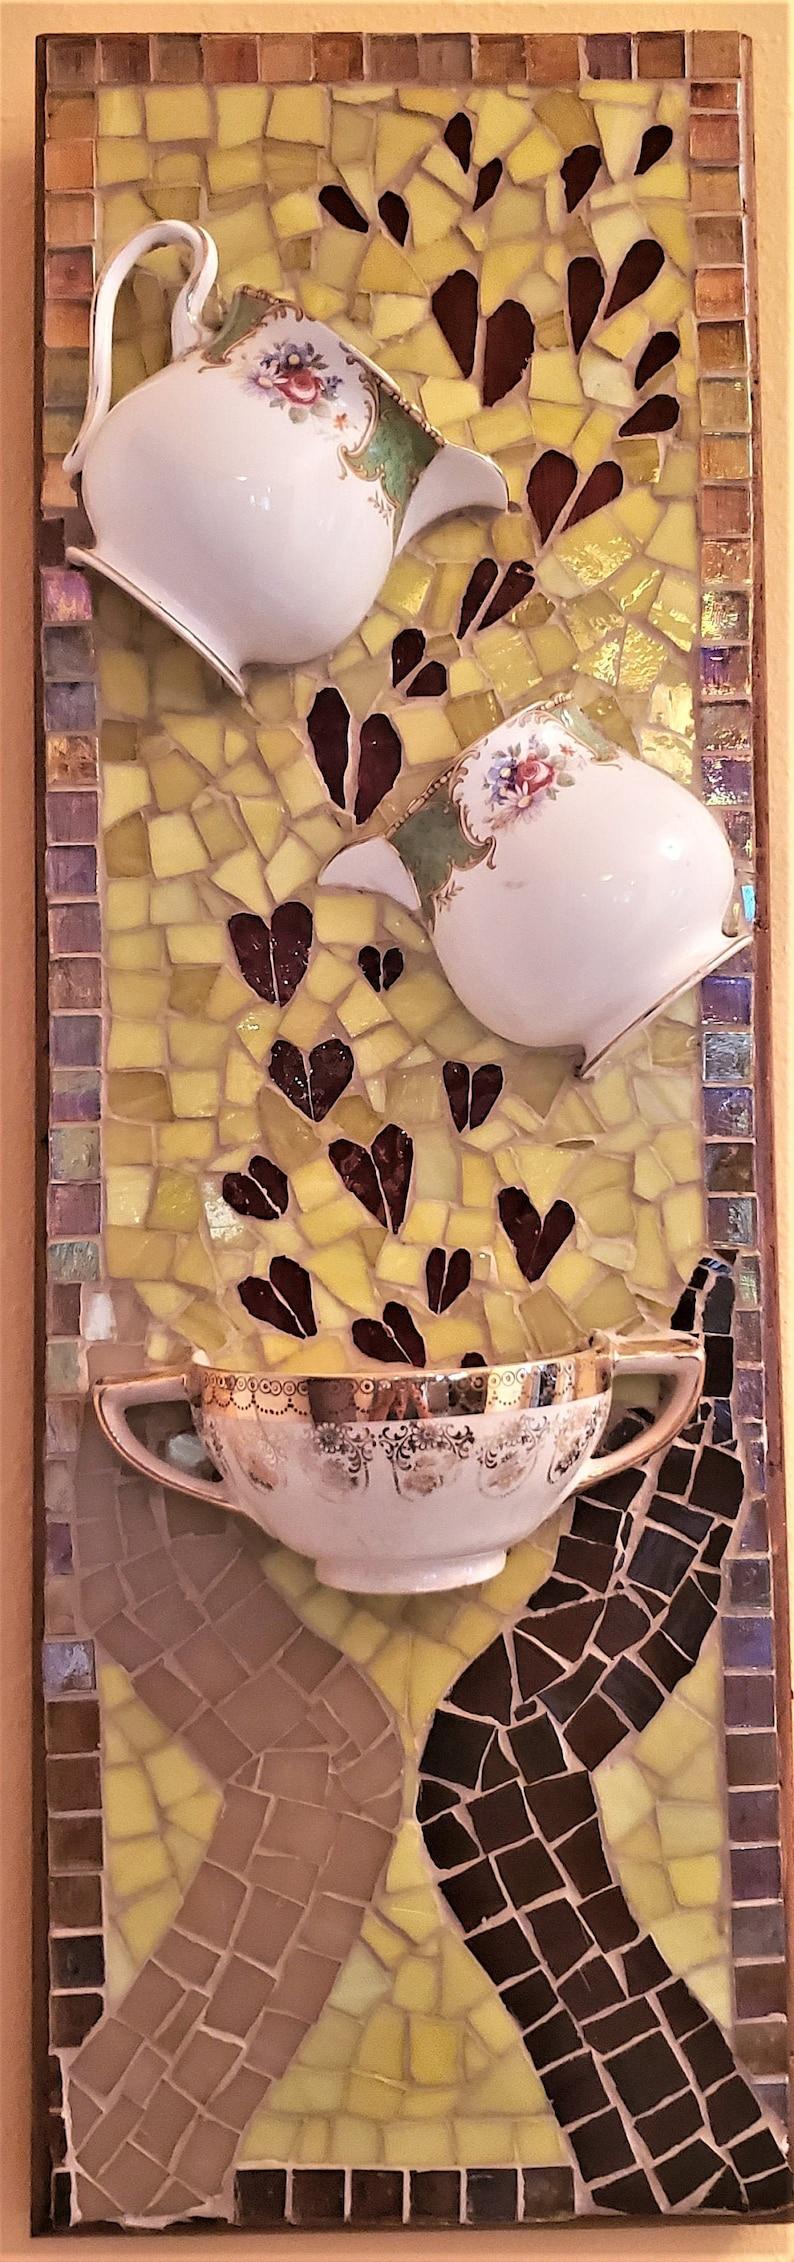 Let Us Unite in Love Mosaic